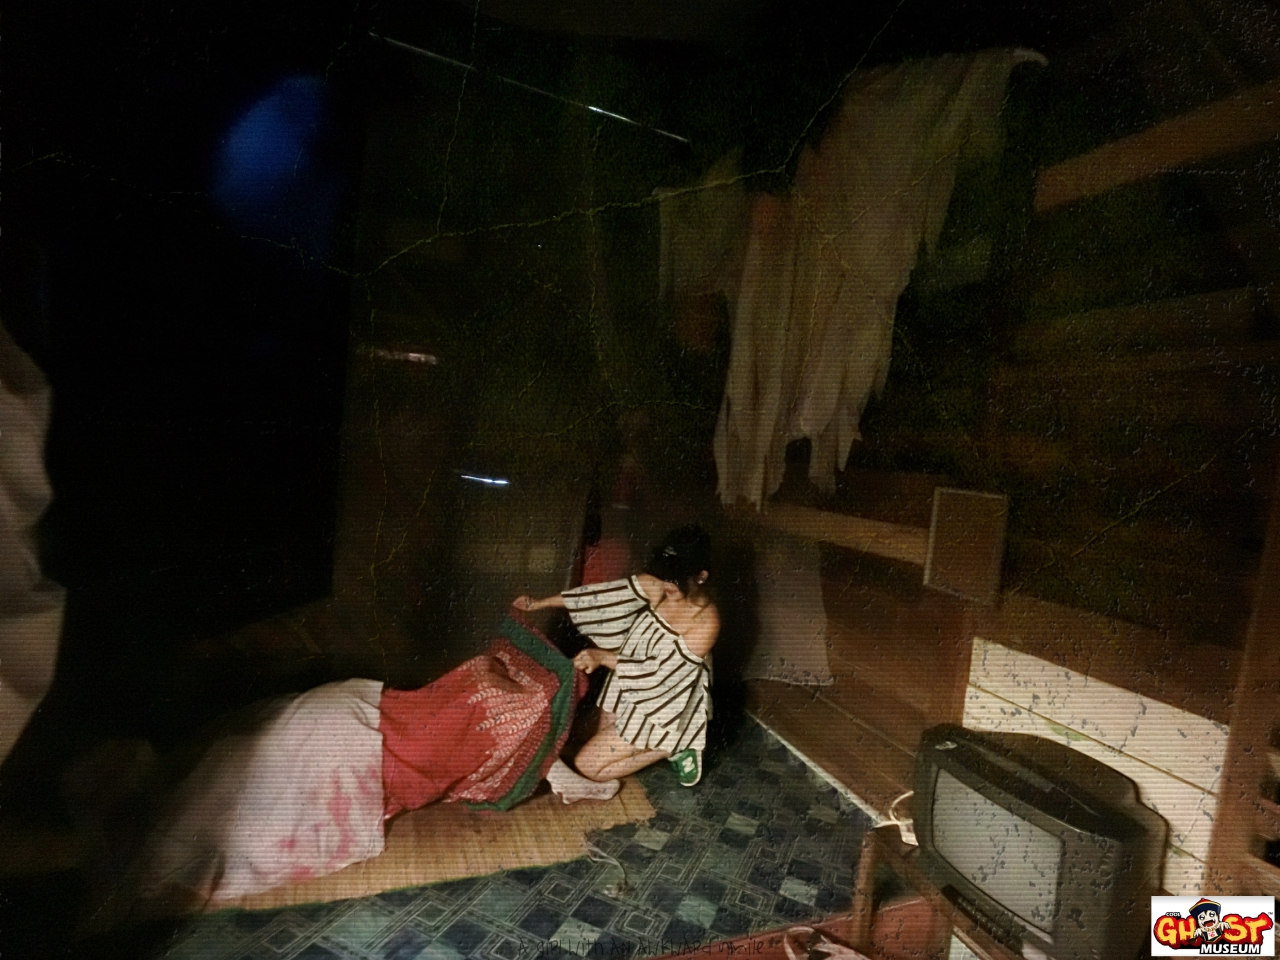 Ghost Museum @Penang : Pontianak Ghost